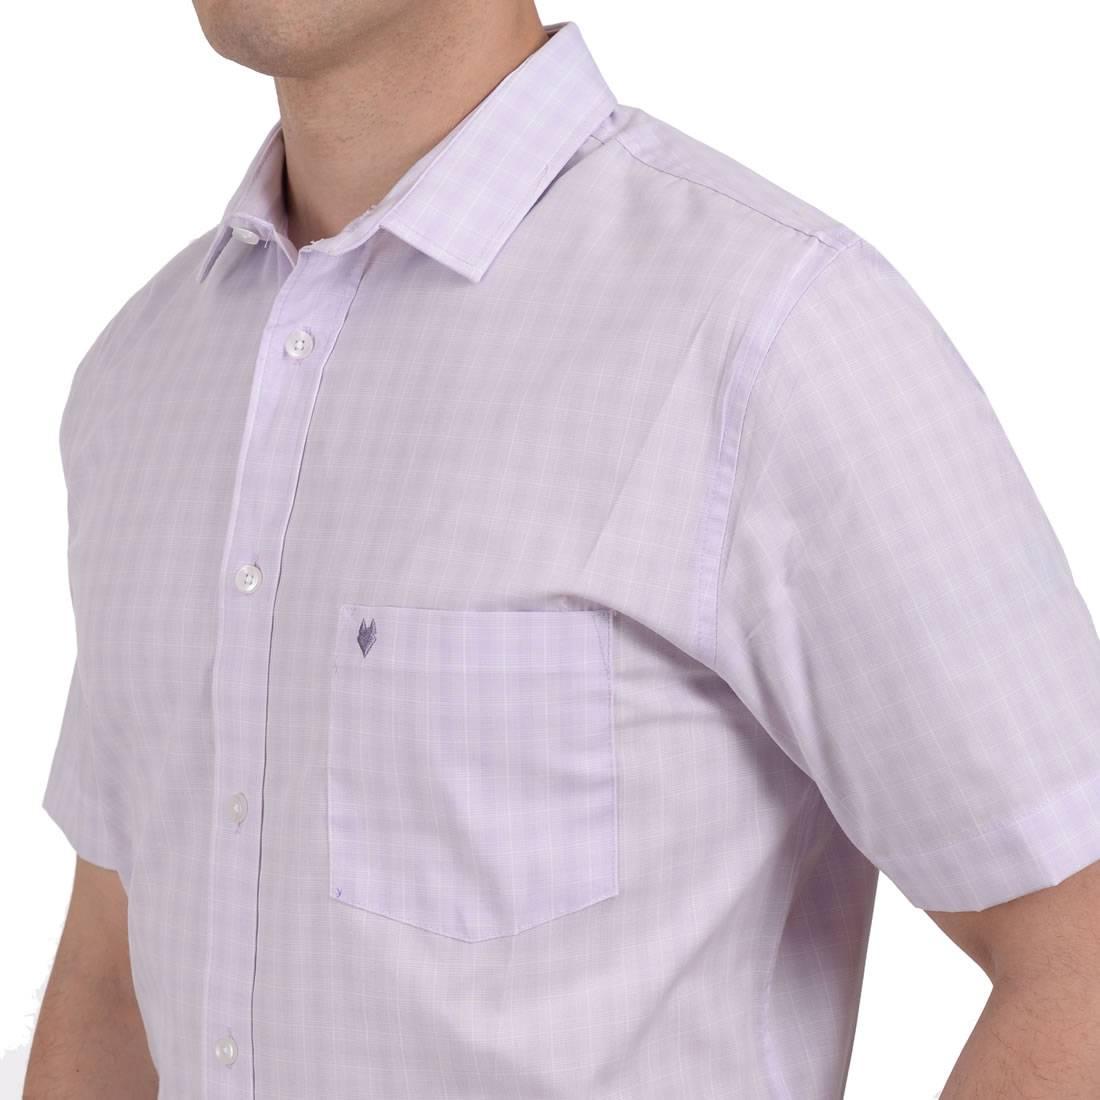 04C217432941-03-Camisa-Casual-Manga-Corta-Classic-Fit-Lila-yale